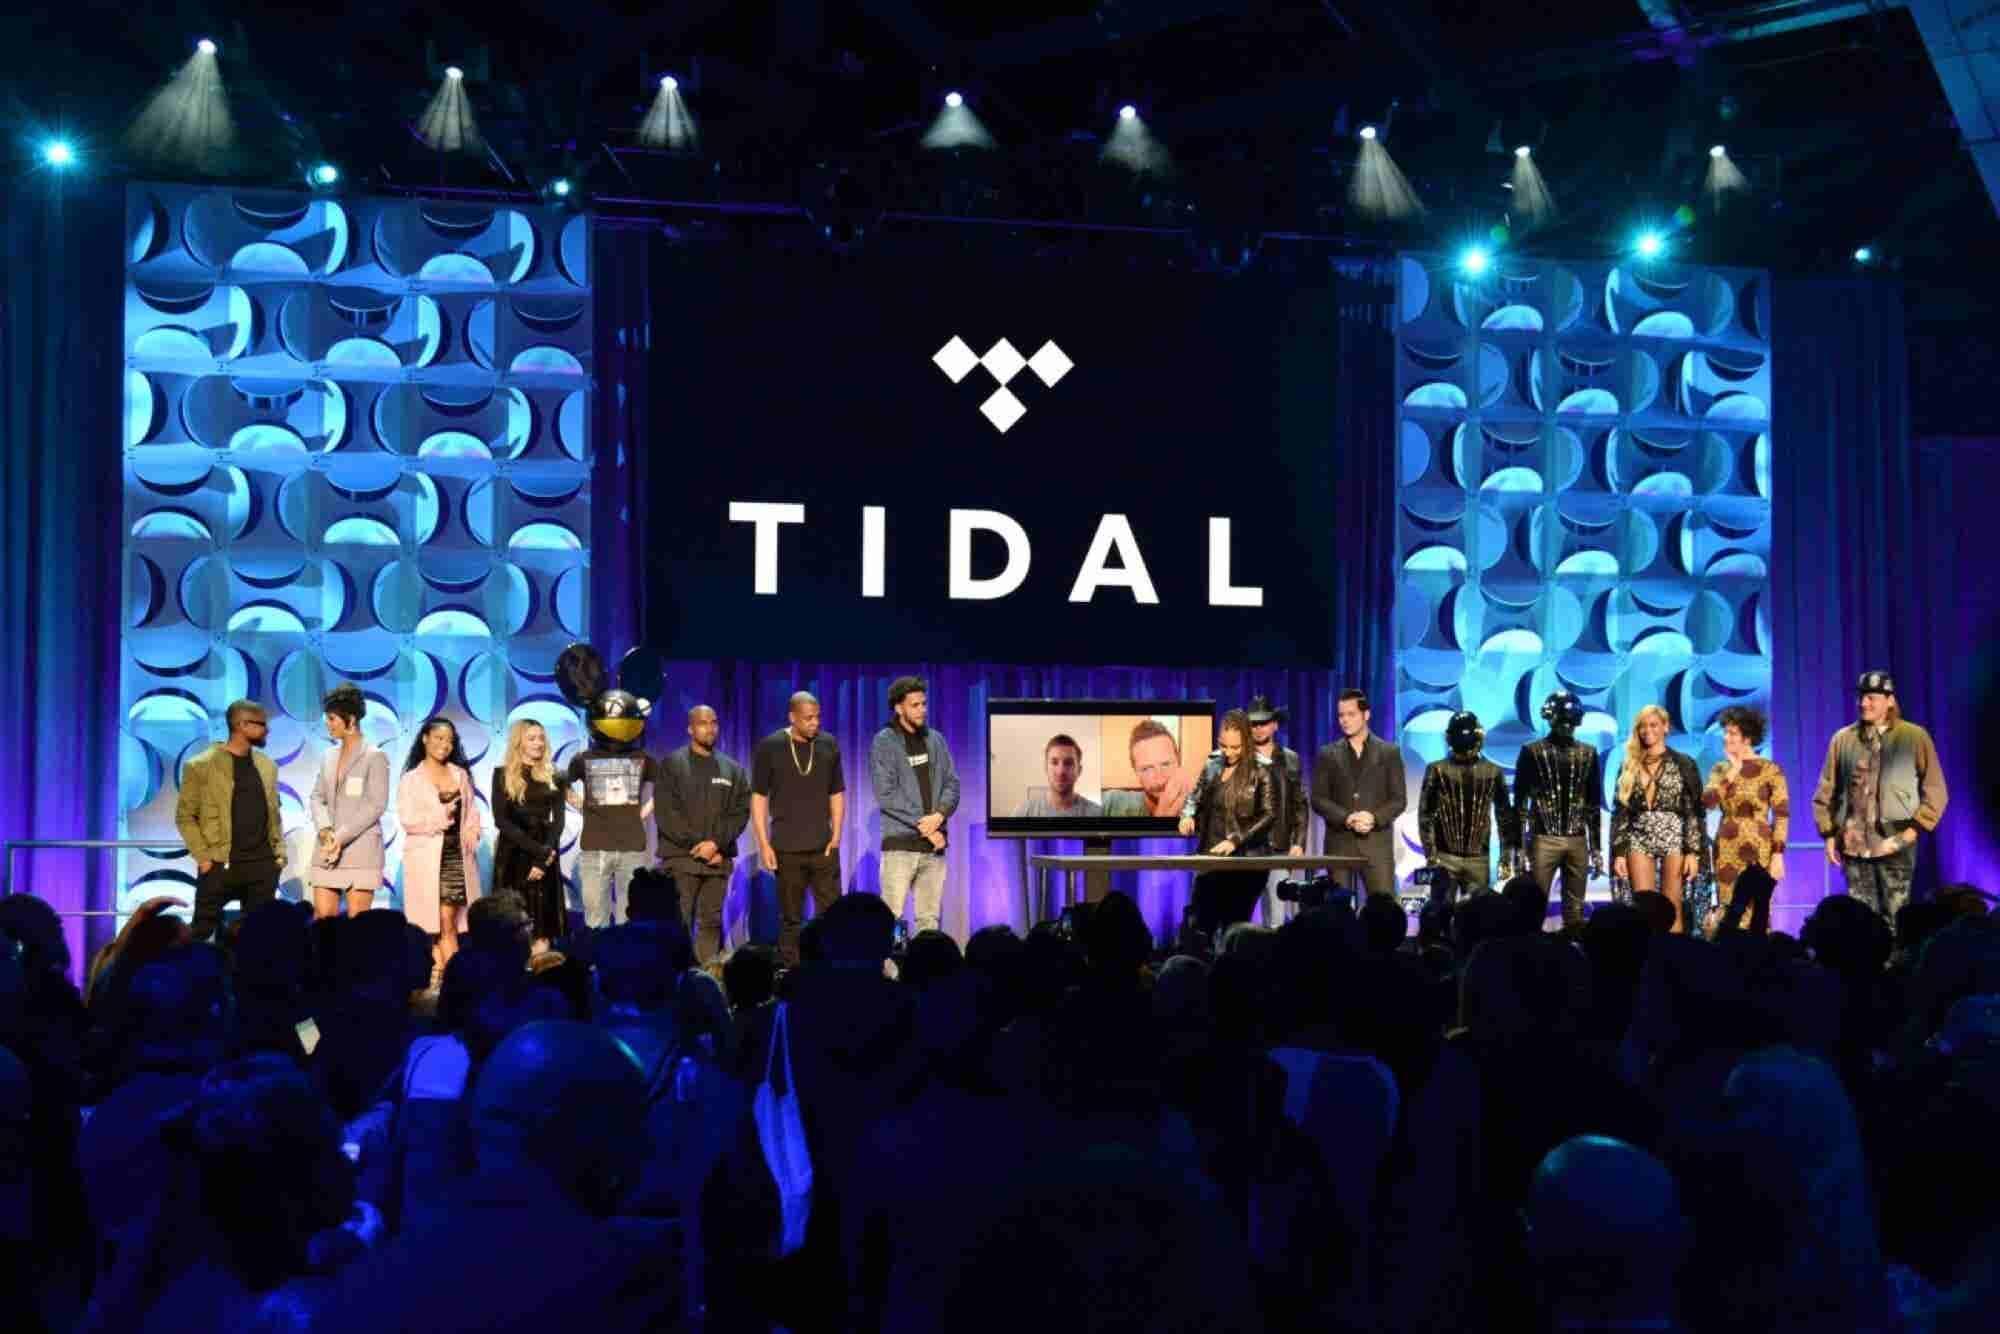 Kanye West to Apple: Buy Tidal Already